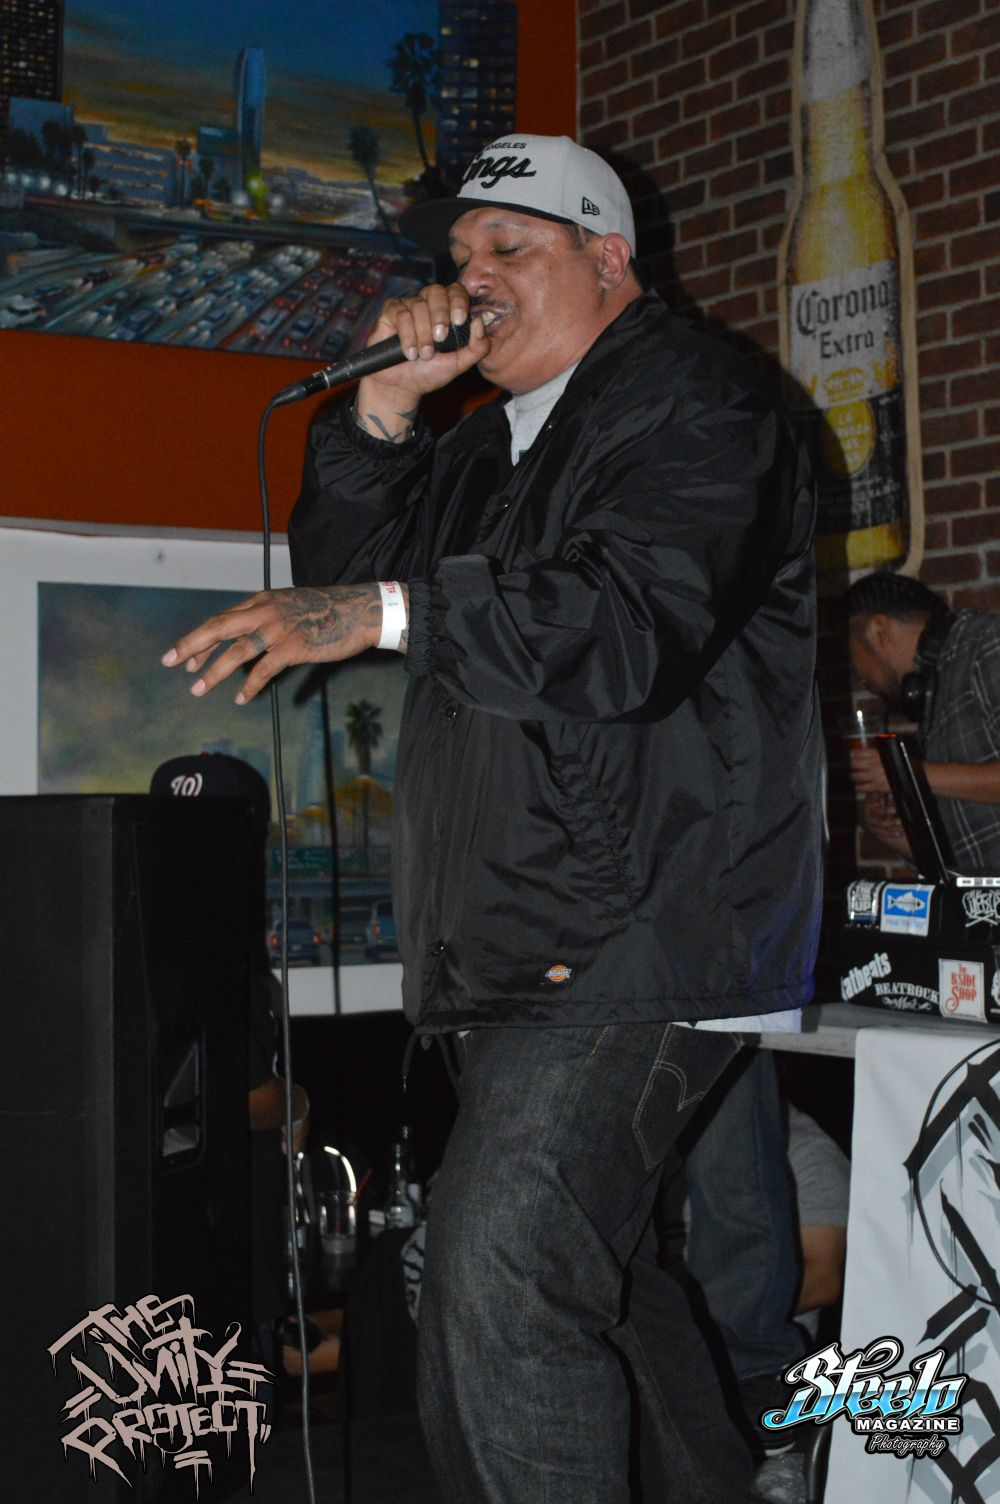 April 23rd Mexakinz show (154)